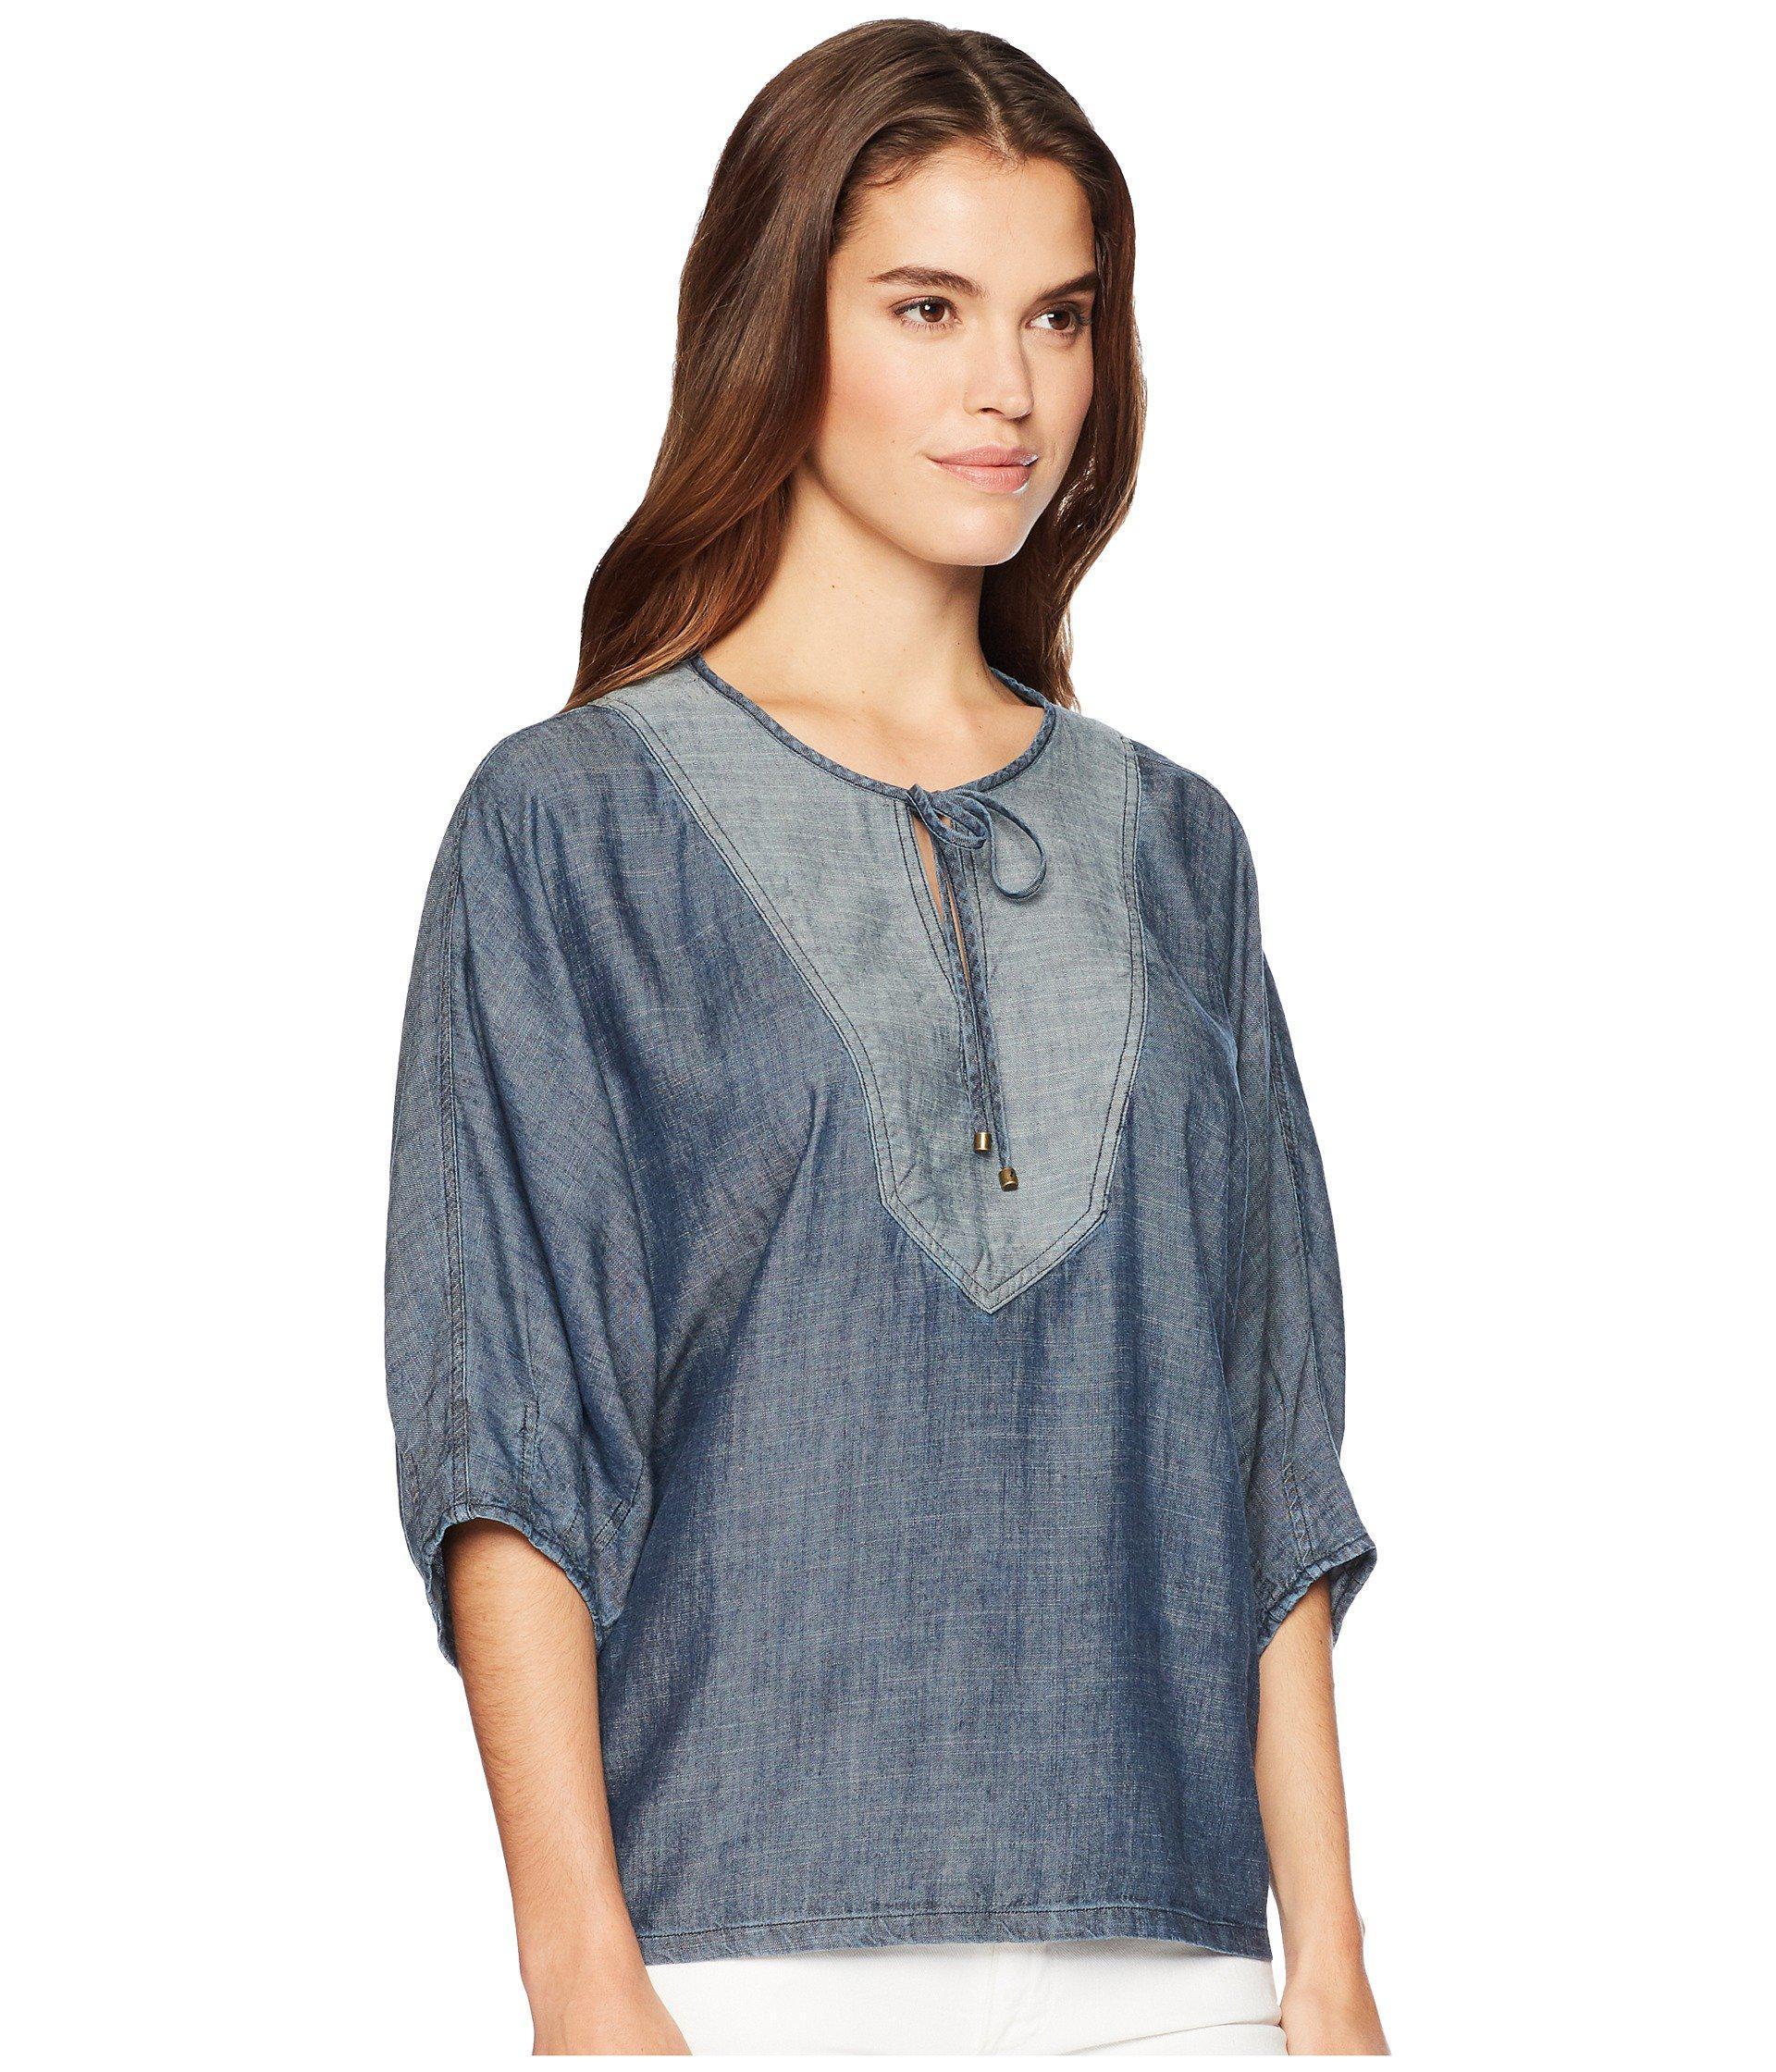 7273b75d1346 Lyst - Trina Turk San Francisco Top (indigo) Women's Clothing in Blue